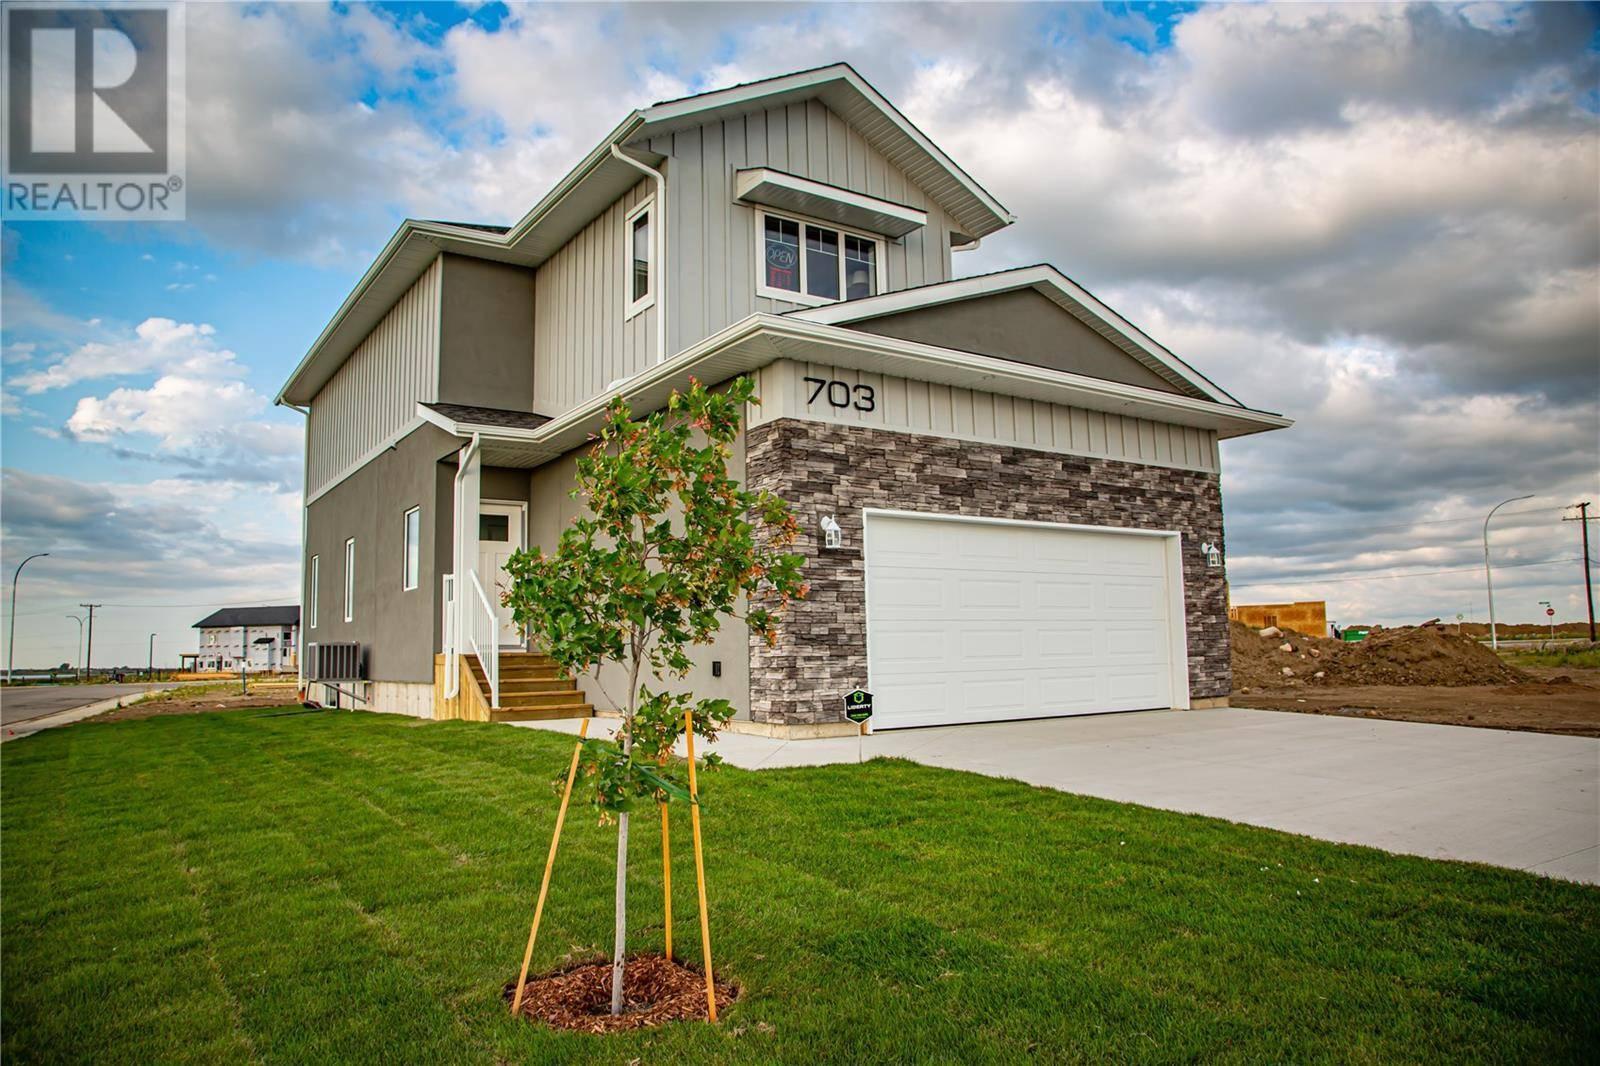 House for sale at 703 Kenaschuk Li Saskatoon Saskatchewan - MLS: SK783283